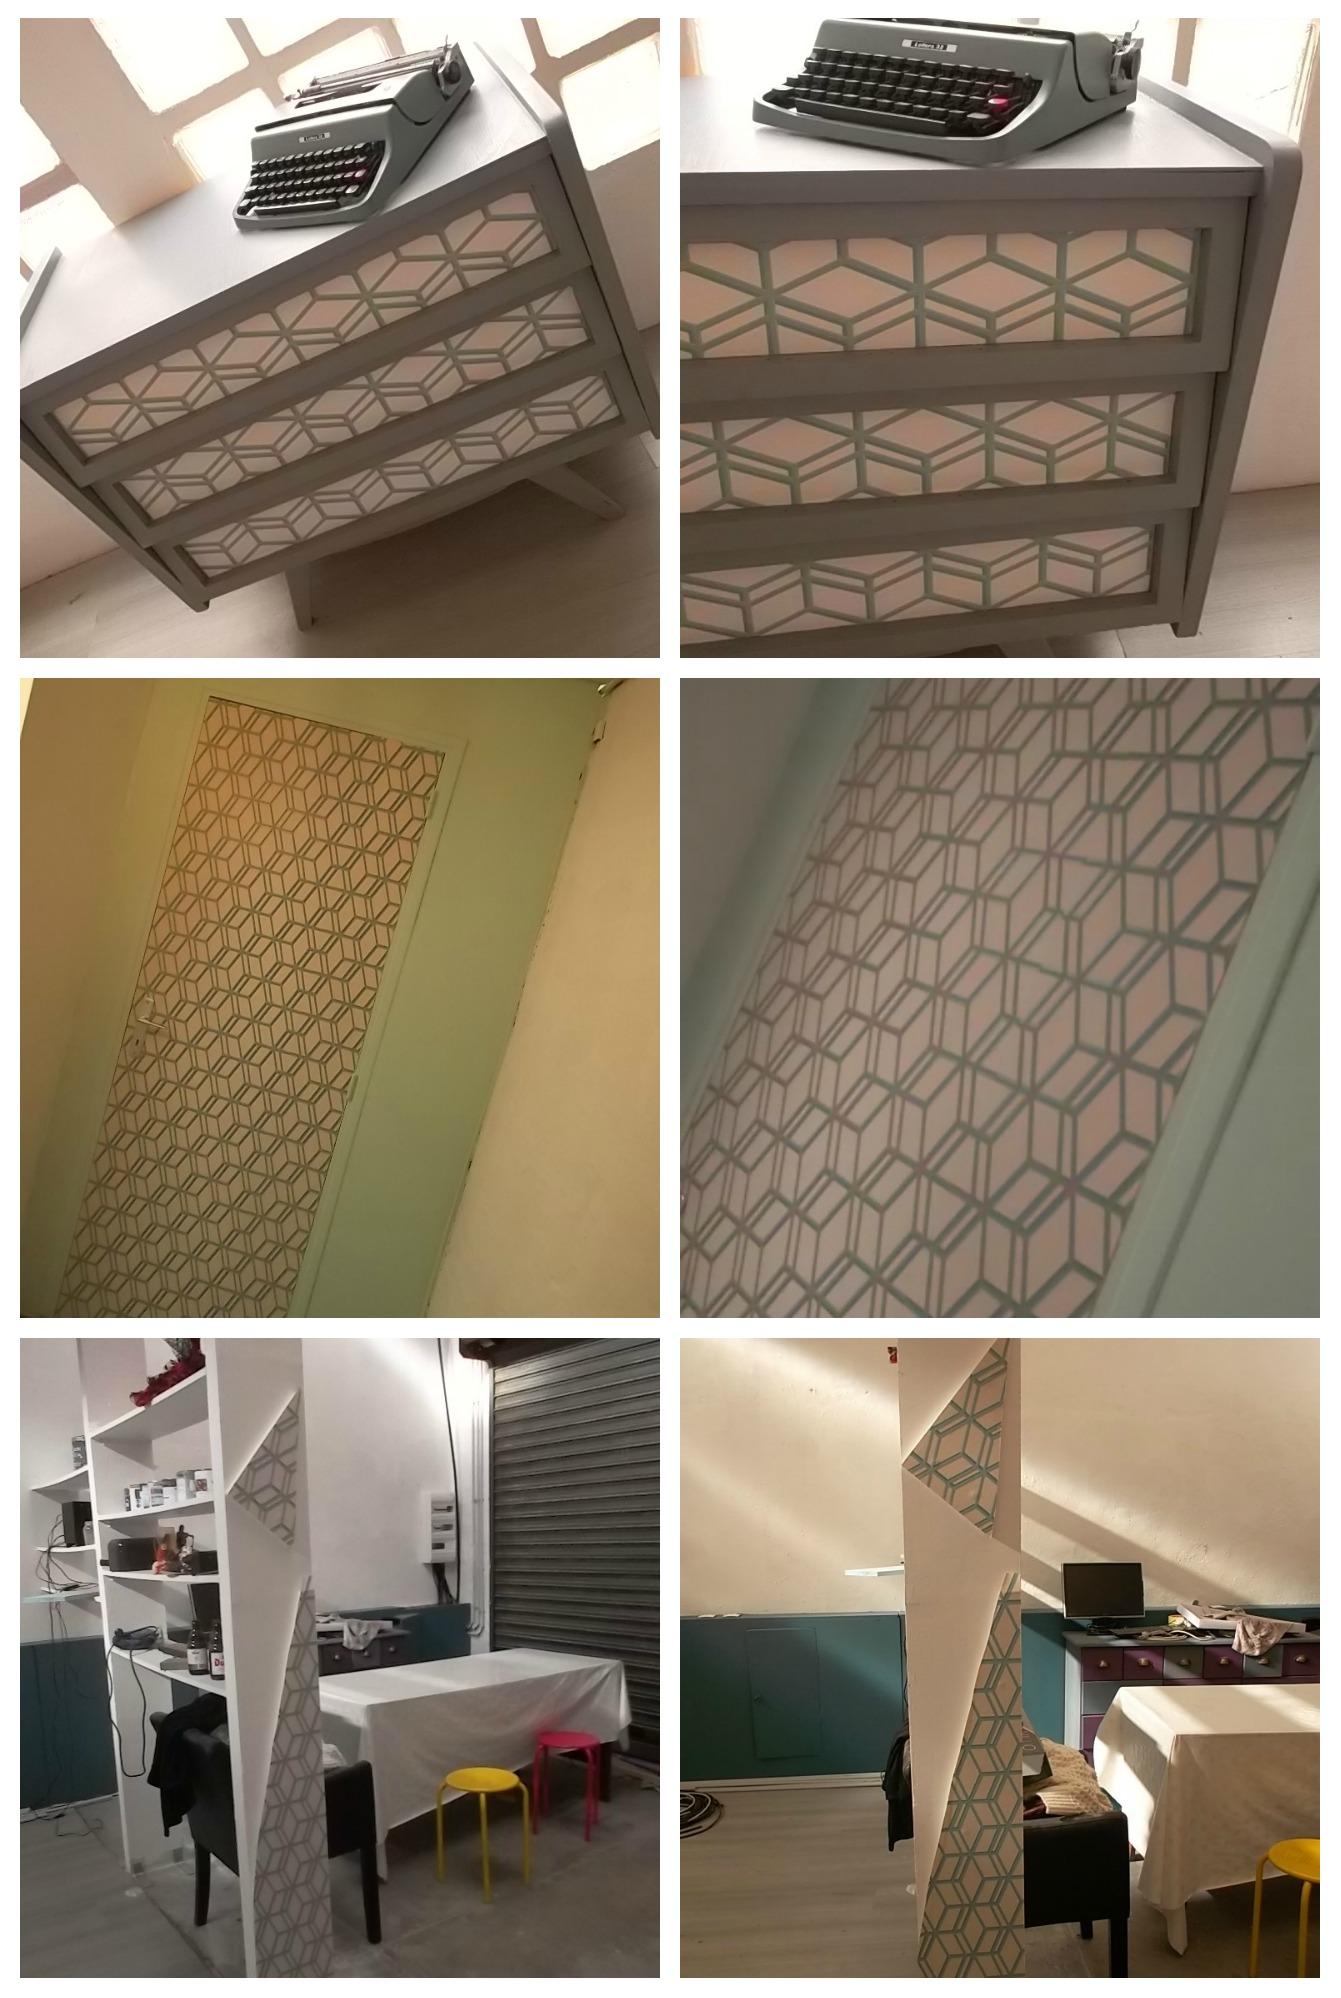 papier peint city style rueil malmaison prix heure menuisier artisan soci t wipxty. Black Bedroom Furniture Sets. Home Design Ideas